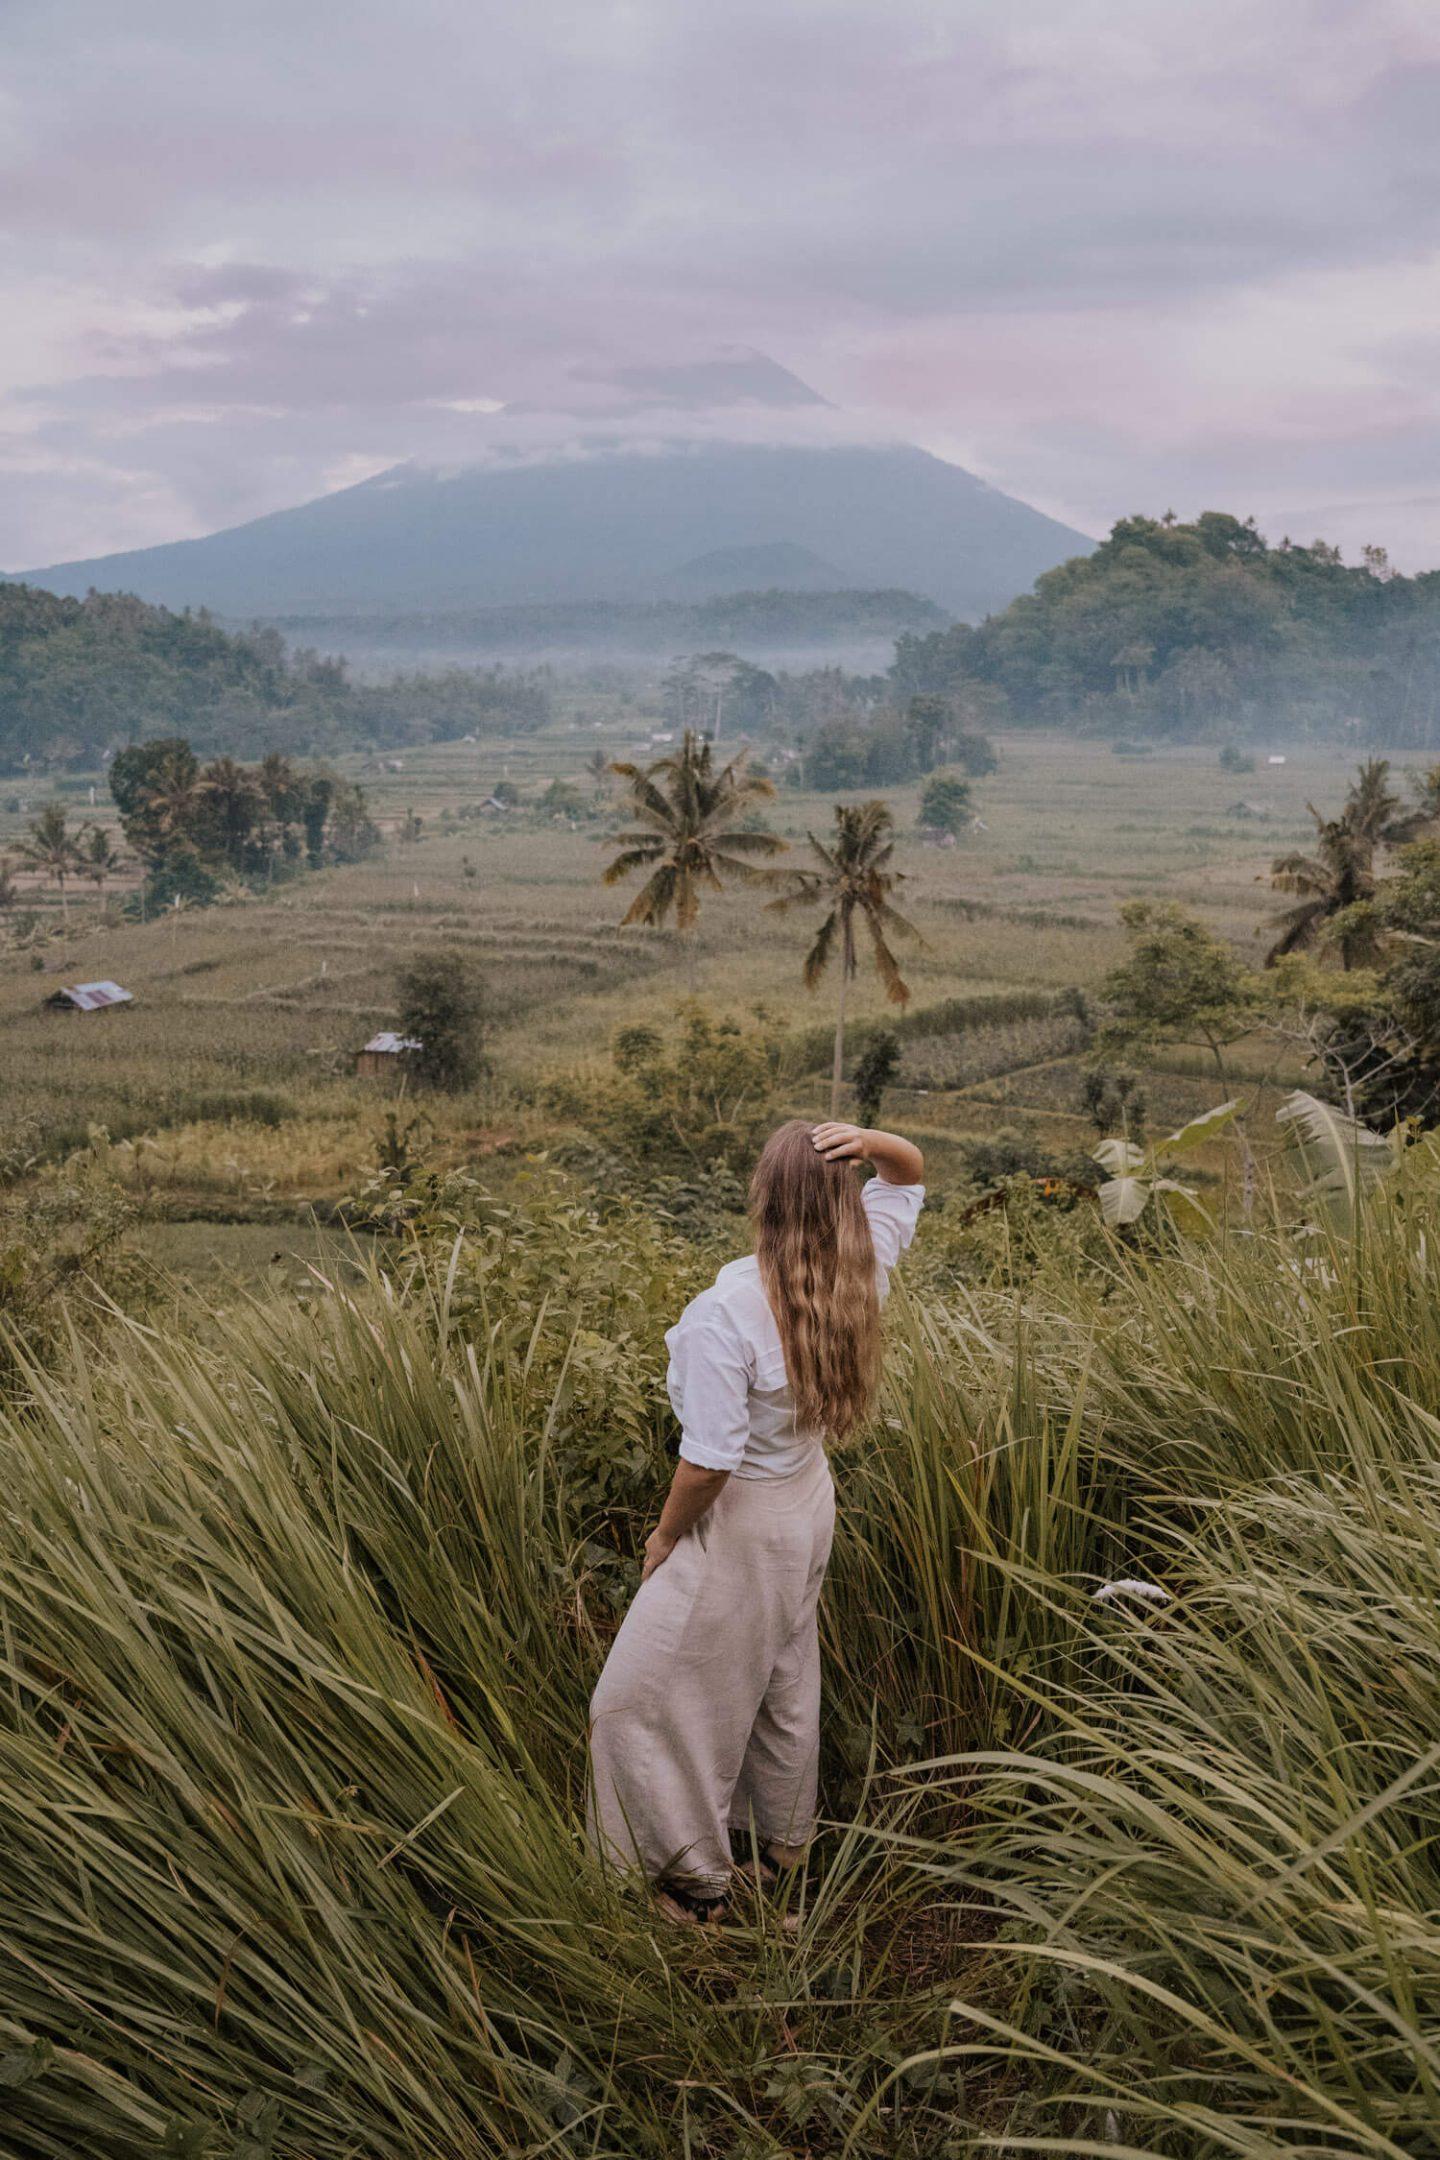 Best View of Mount Agung